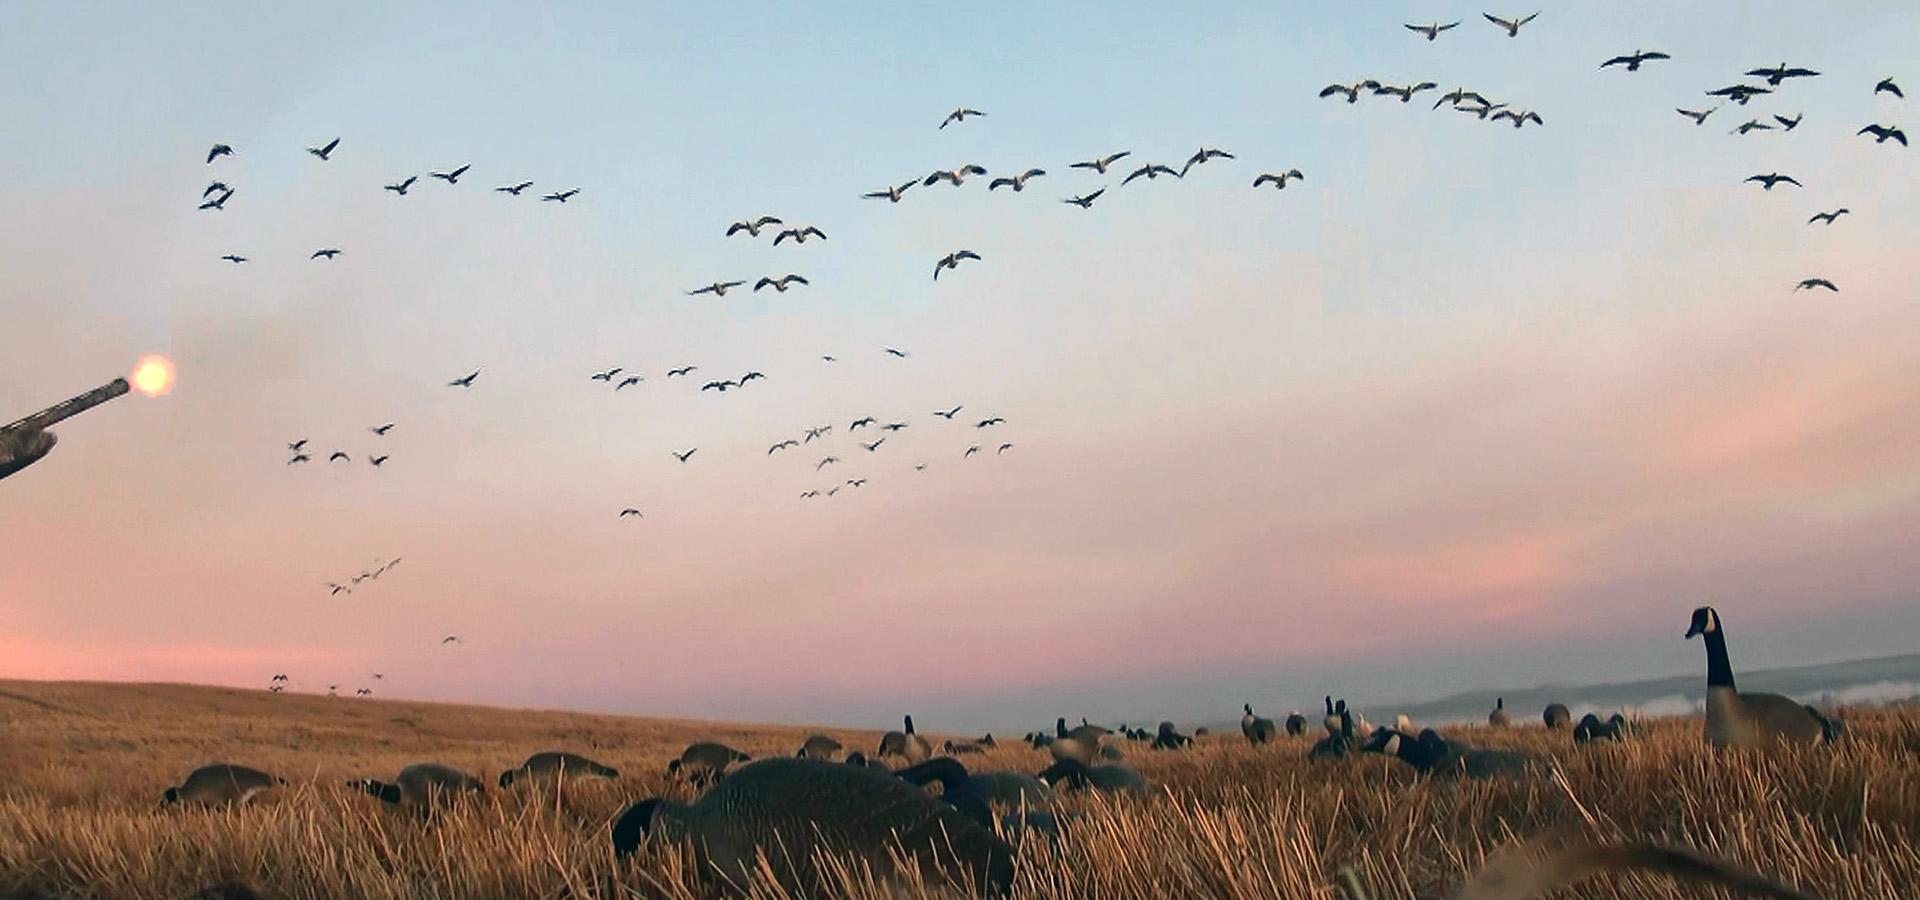 Waterfowl Hunting Saskatchewan Canada - Flock - HD Wallpaper